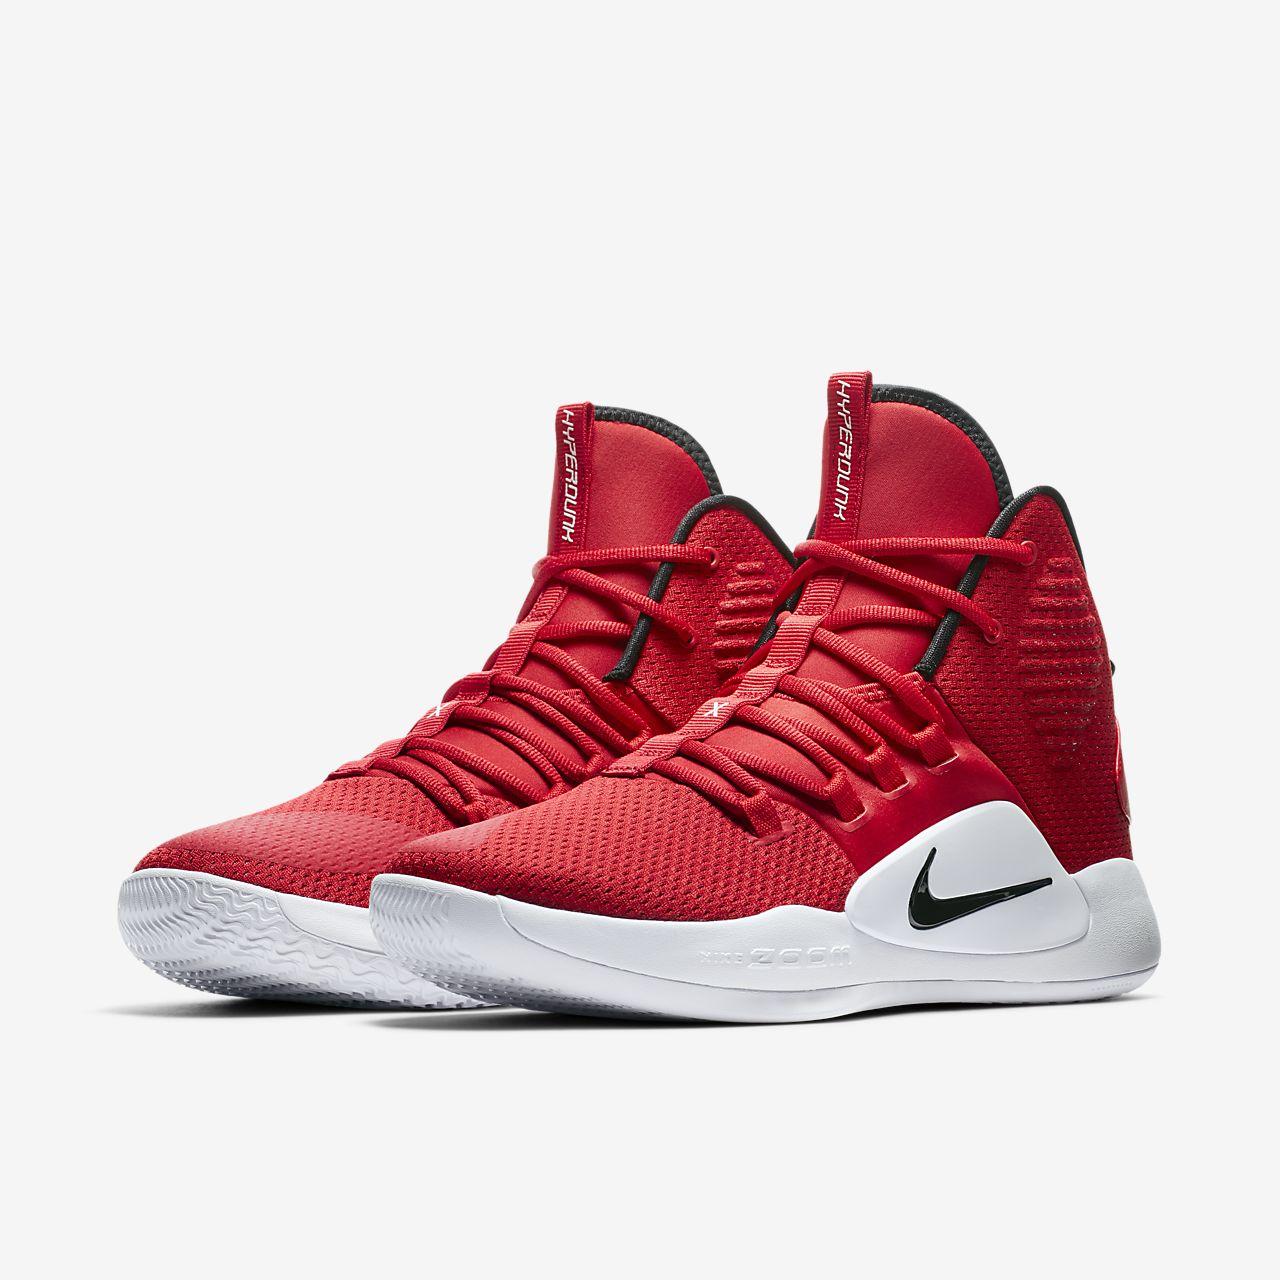 huge discount ed9a8 43437 Low Resolution Nike Hyperdunk X TB Basketball Shoe Nike Hyperdunk X TB  Basketball Shoe